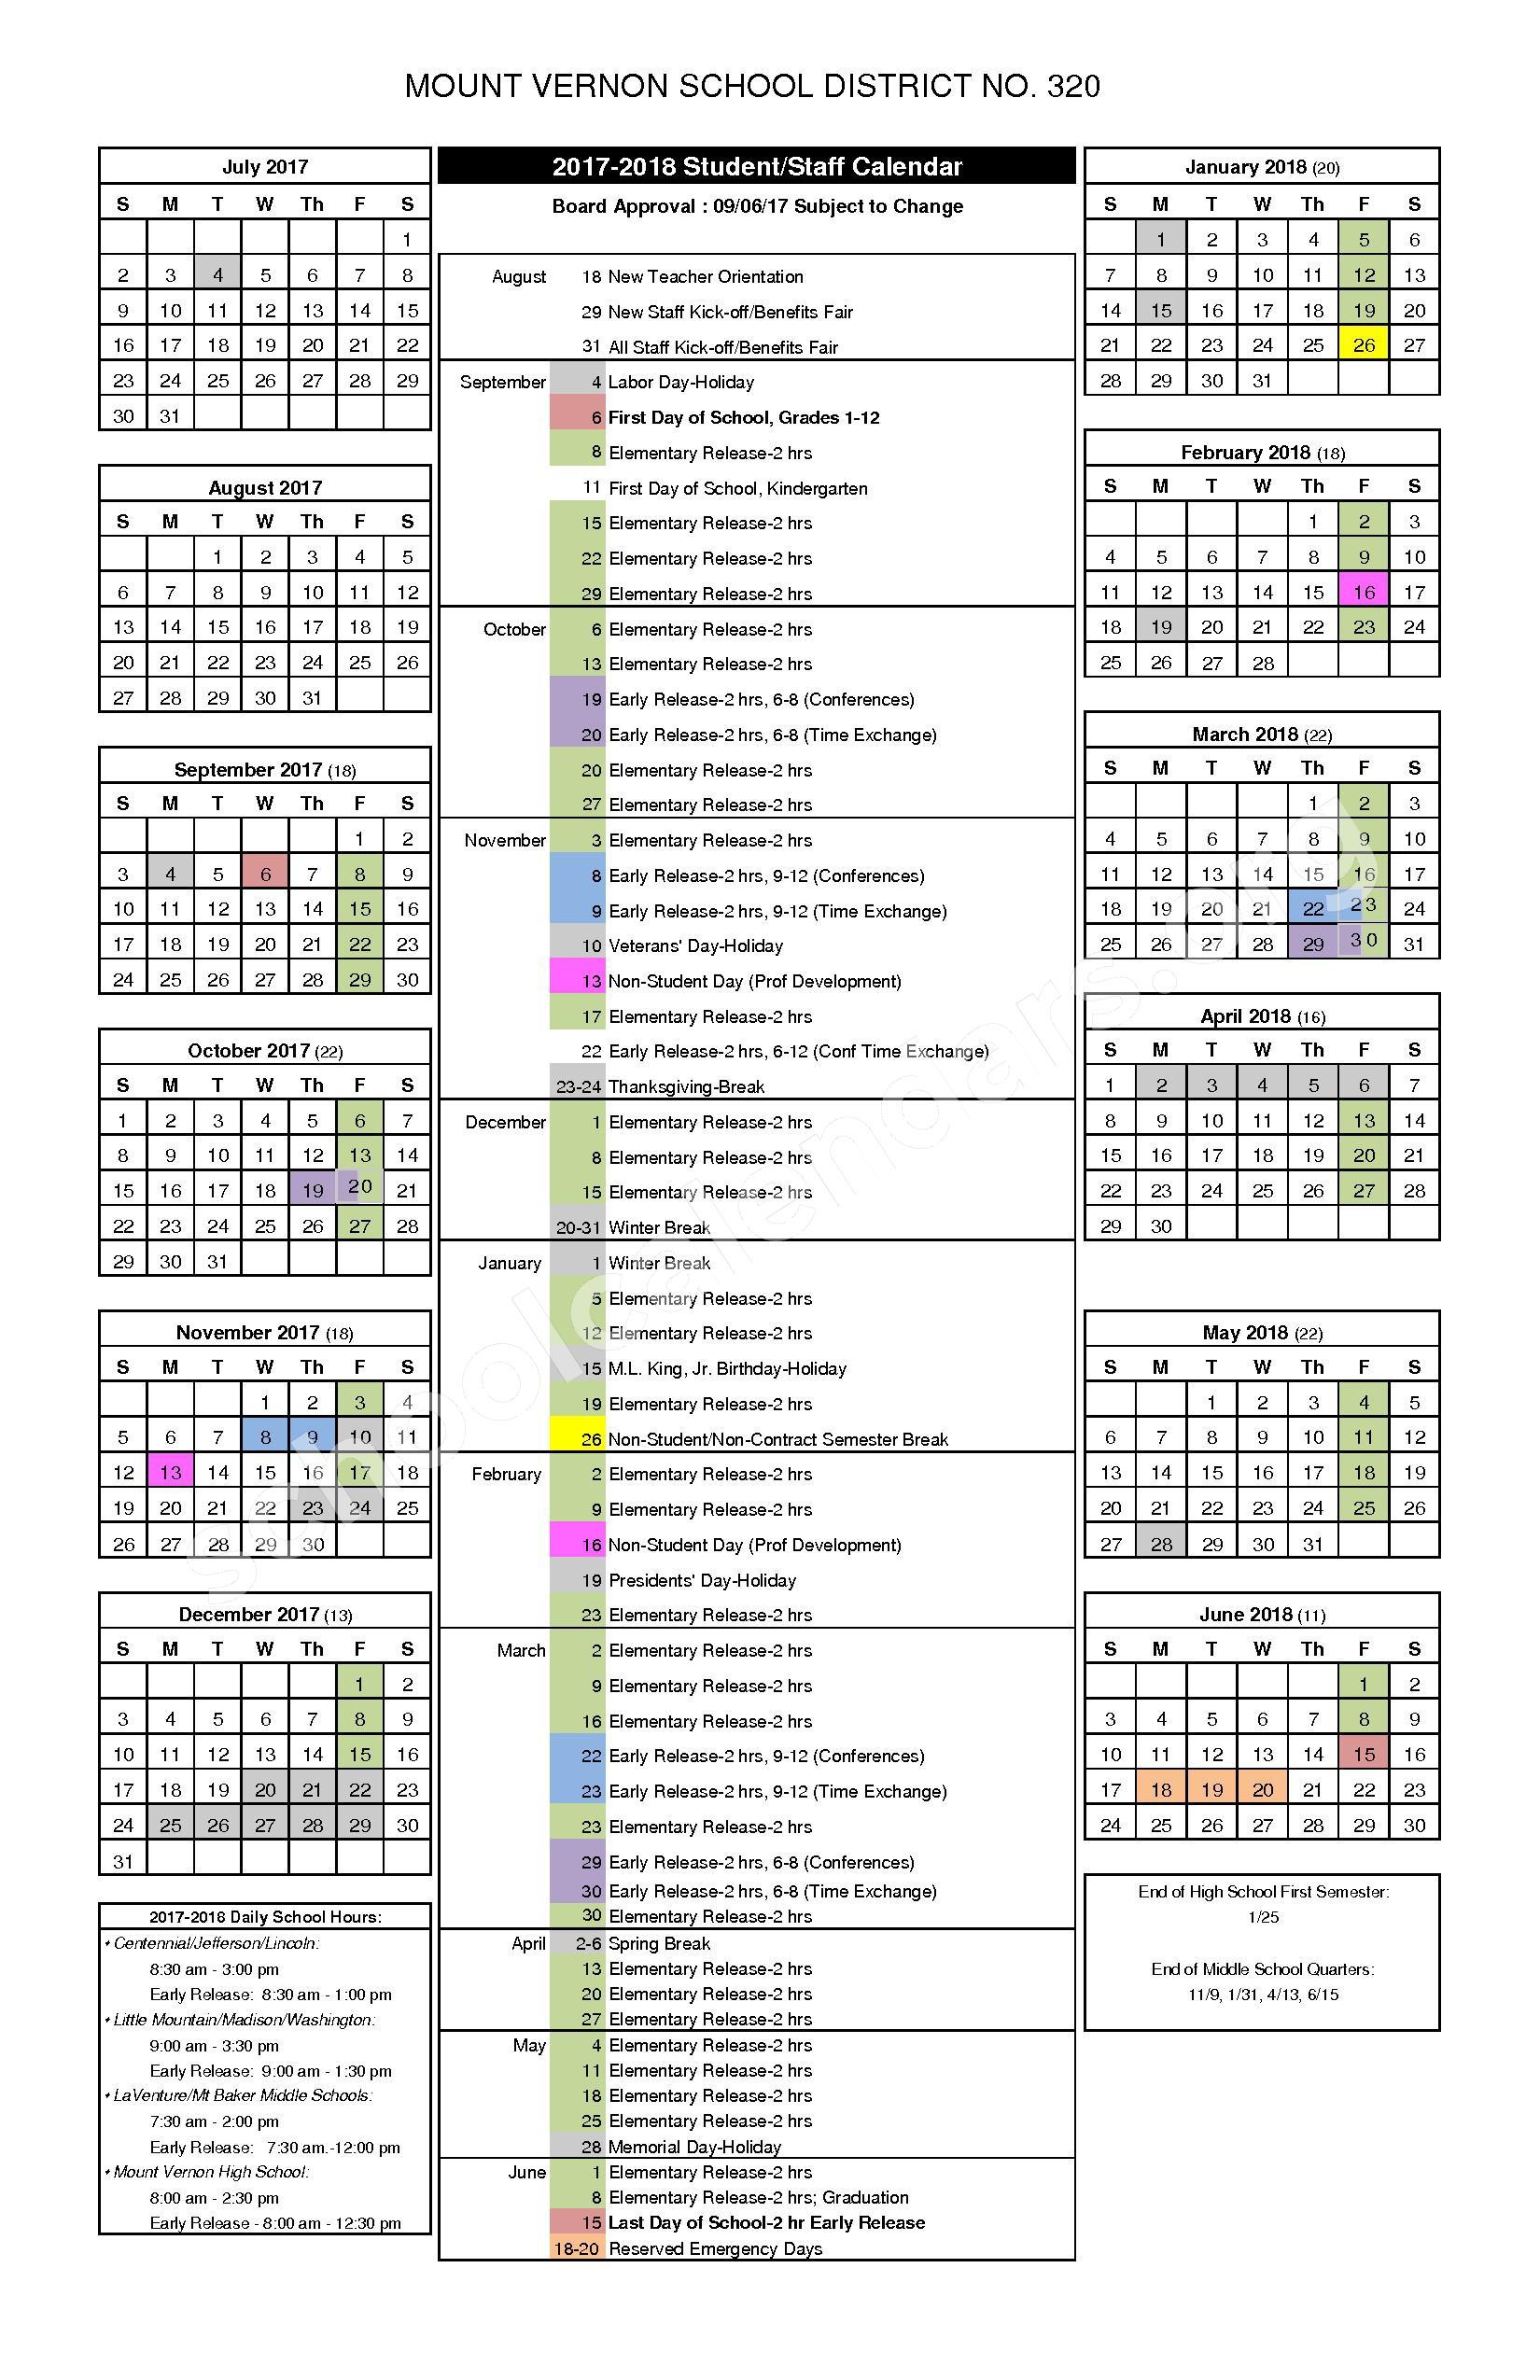 2017 - 2018 MVSD Student/Staff Calendar – Mount Vernon School District – page 1